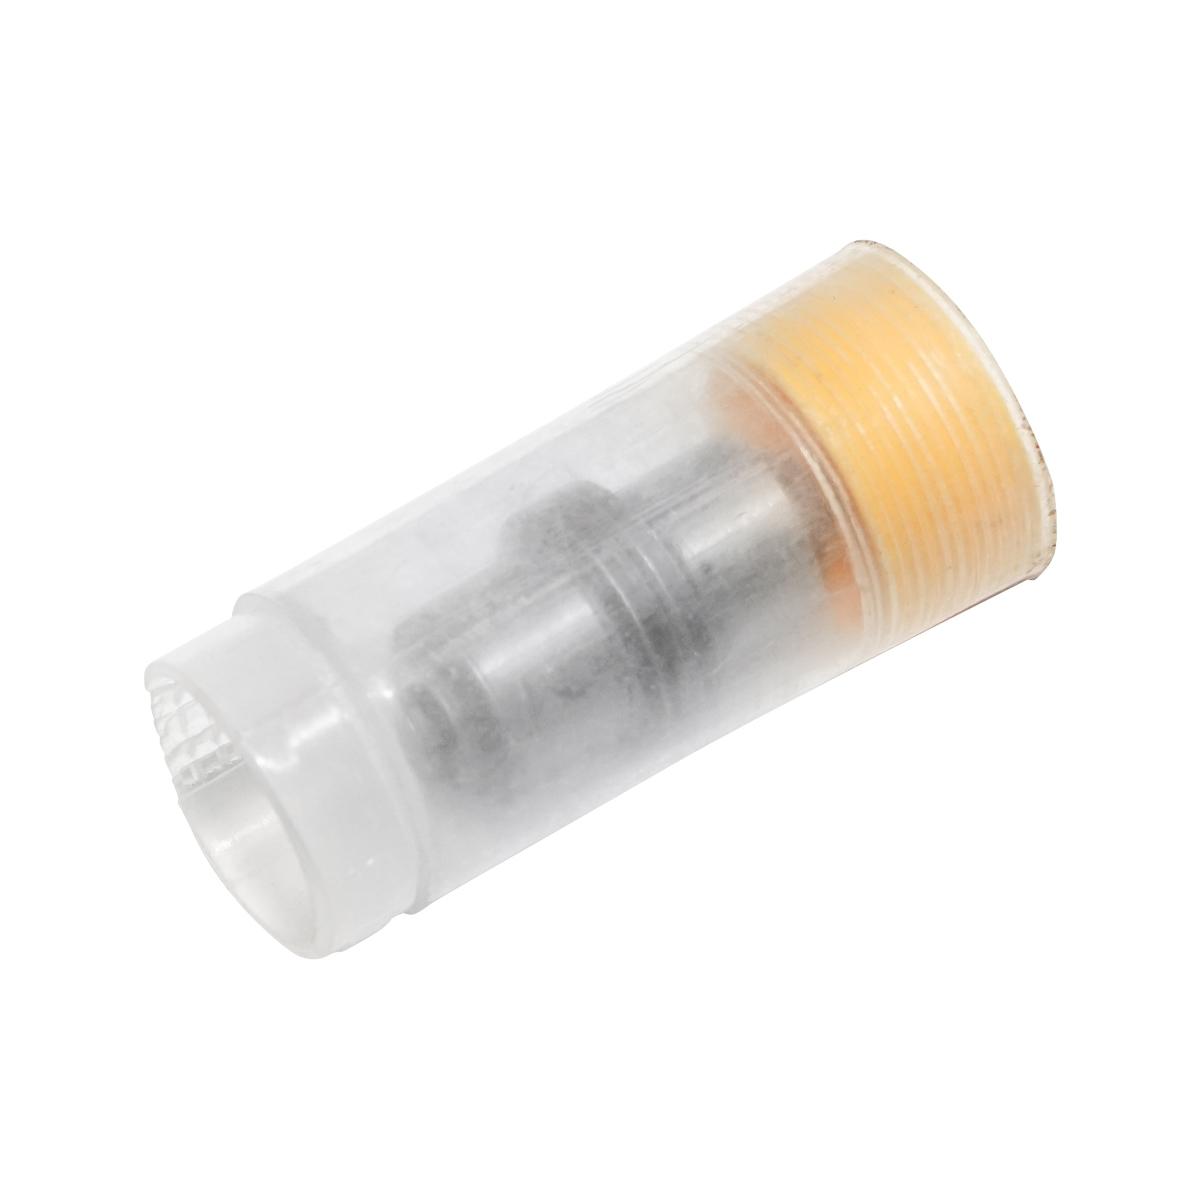 Diuza supapa refulare pompa injectie UTB U-650 1.418.522.055